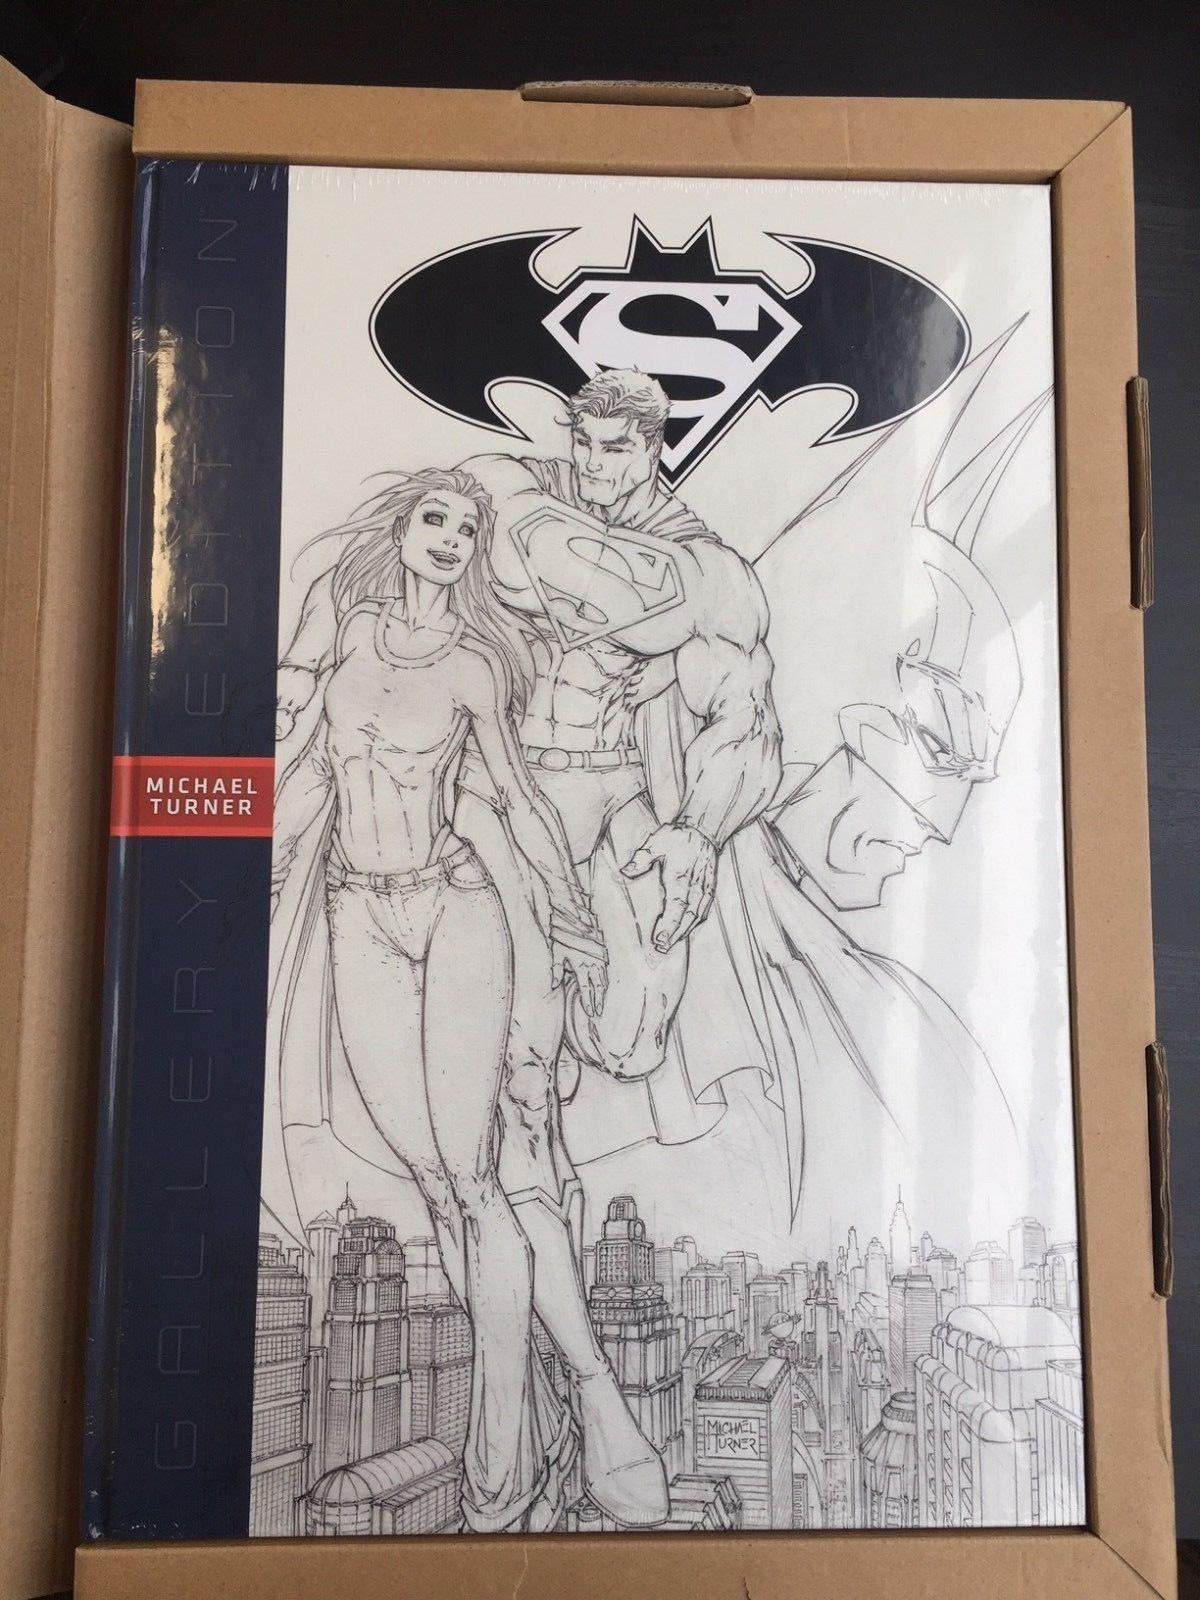 SUPERMAN BATMAN MICHAEL TURNER GALLERY EDITION OVER-SIZED HARDCOVER New Hardback